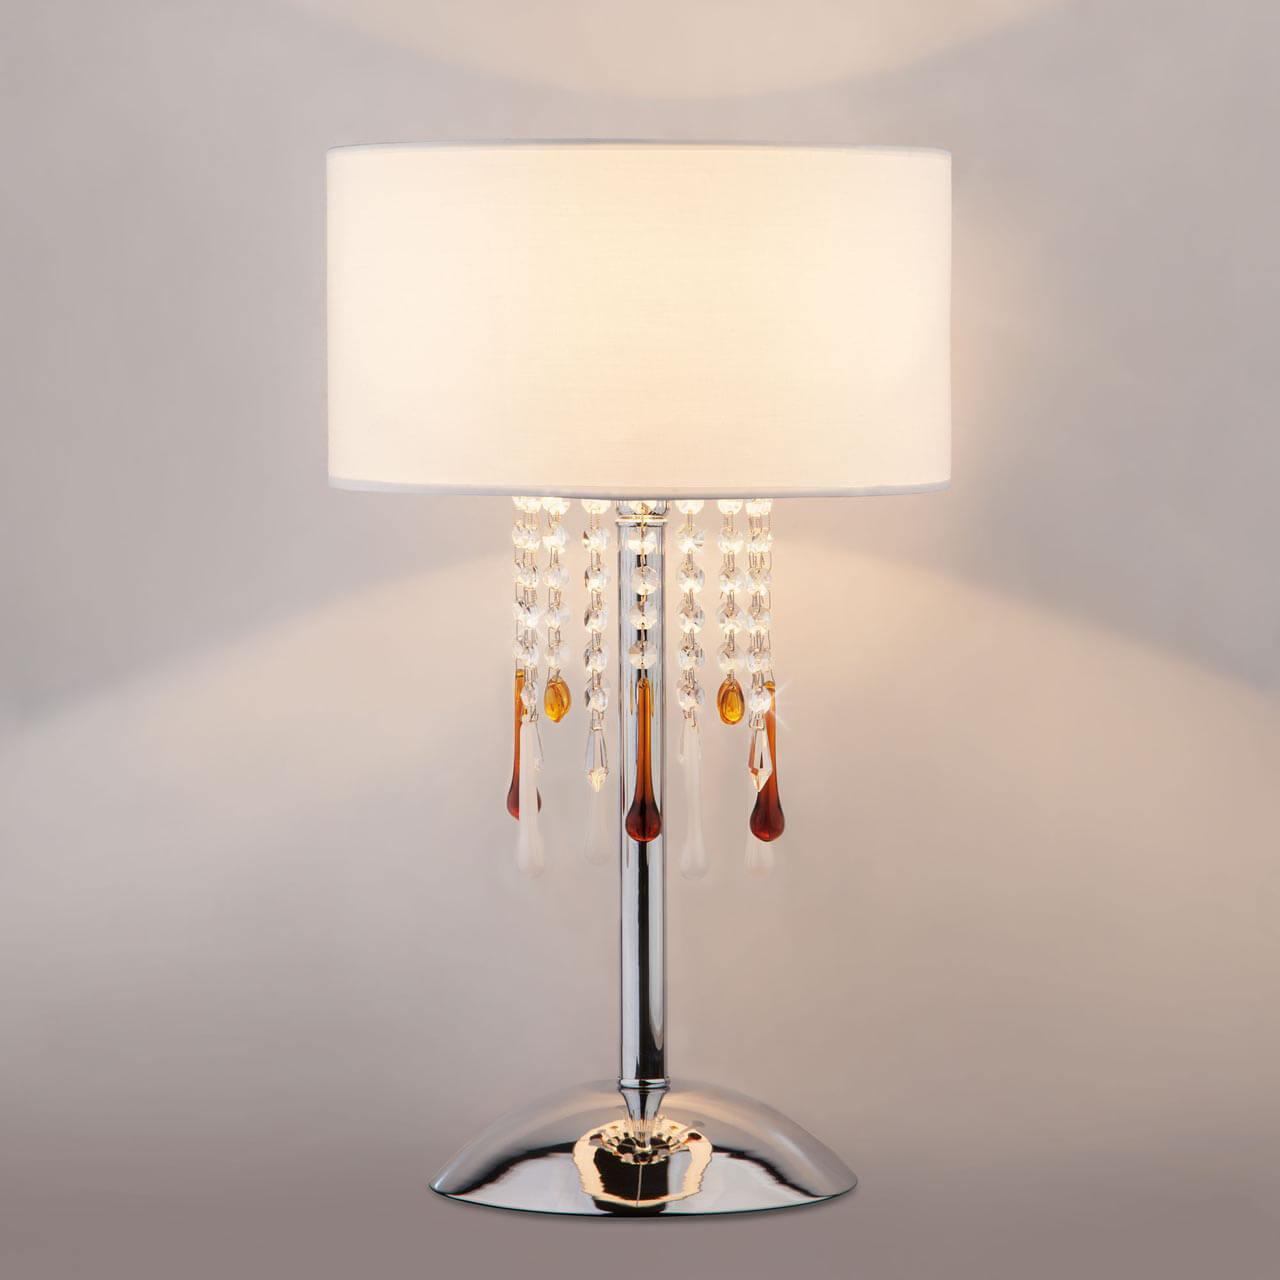 Настольный светильник Bogates 01097/1 Strotskis, E14, 60 Вт цены